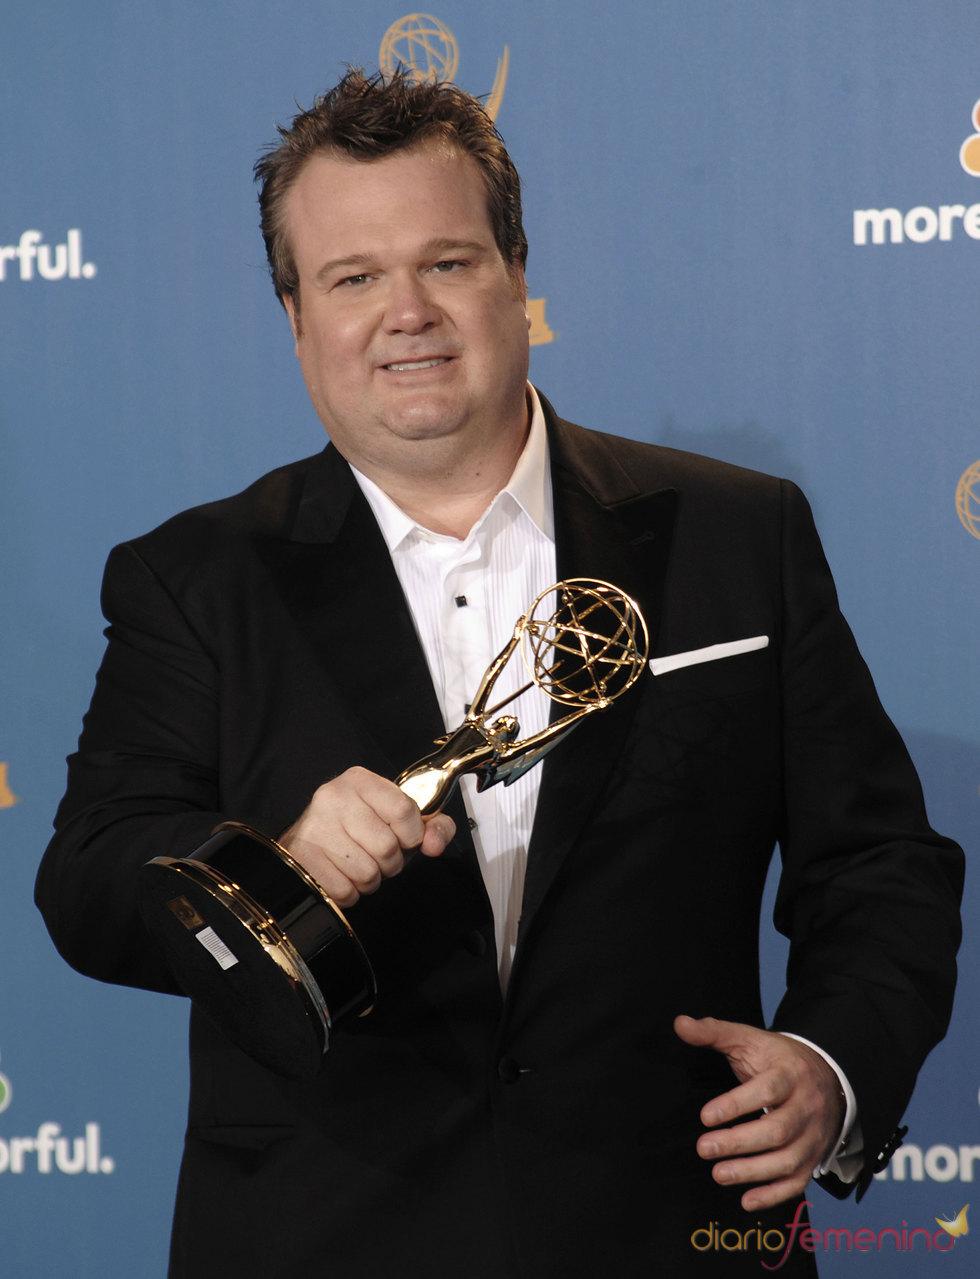 Eric Stonestreet de  Modern Family  gana el Emmy 2010 de mejor actor    Eric Stonestreet Modern Family